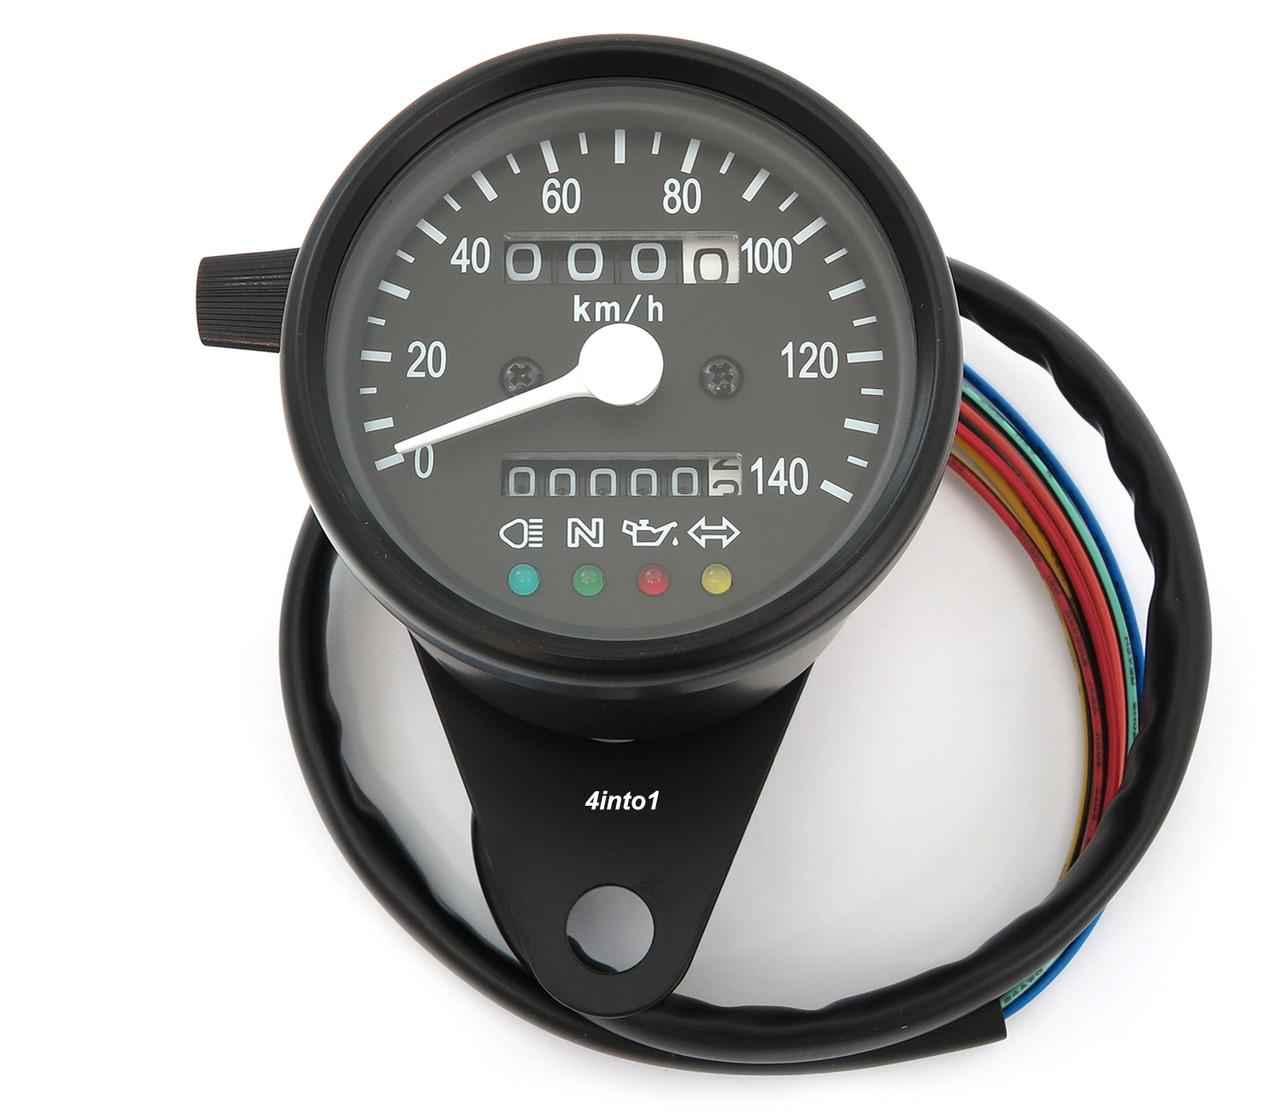 Mini Speedometer w/ Indicator Lights & Trip Meter - 2240:60 - Black - KMH